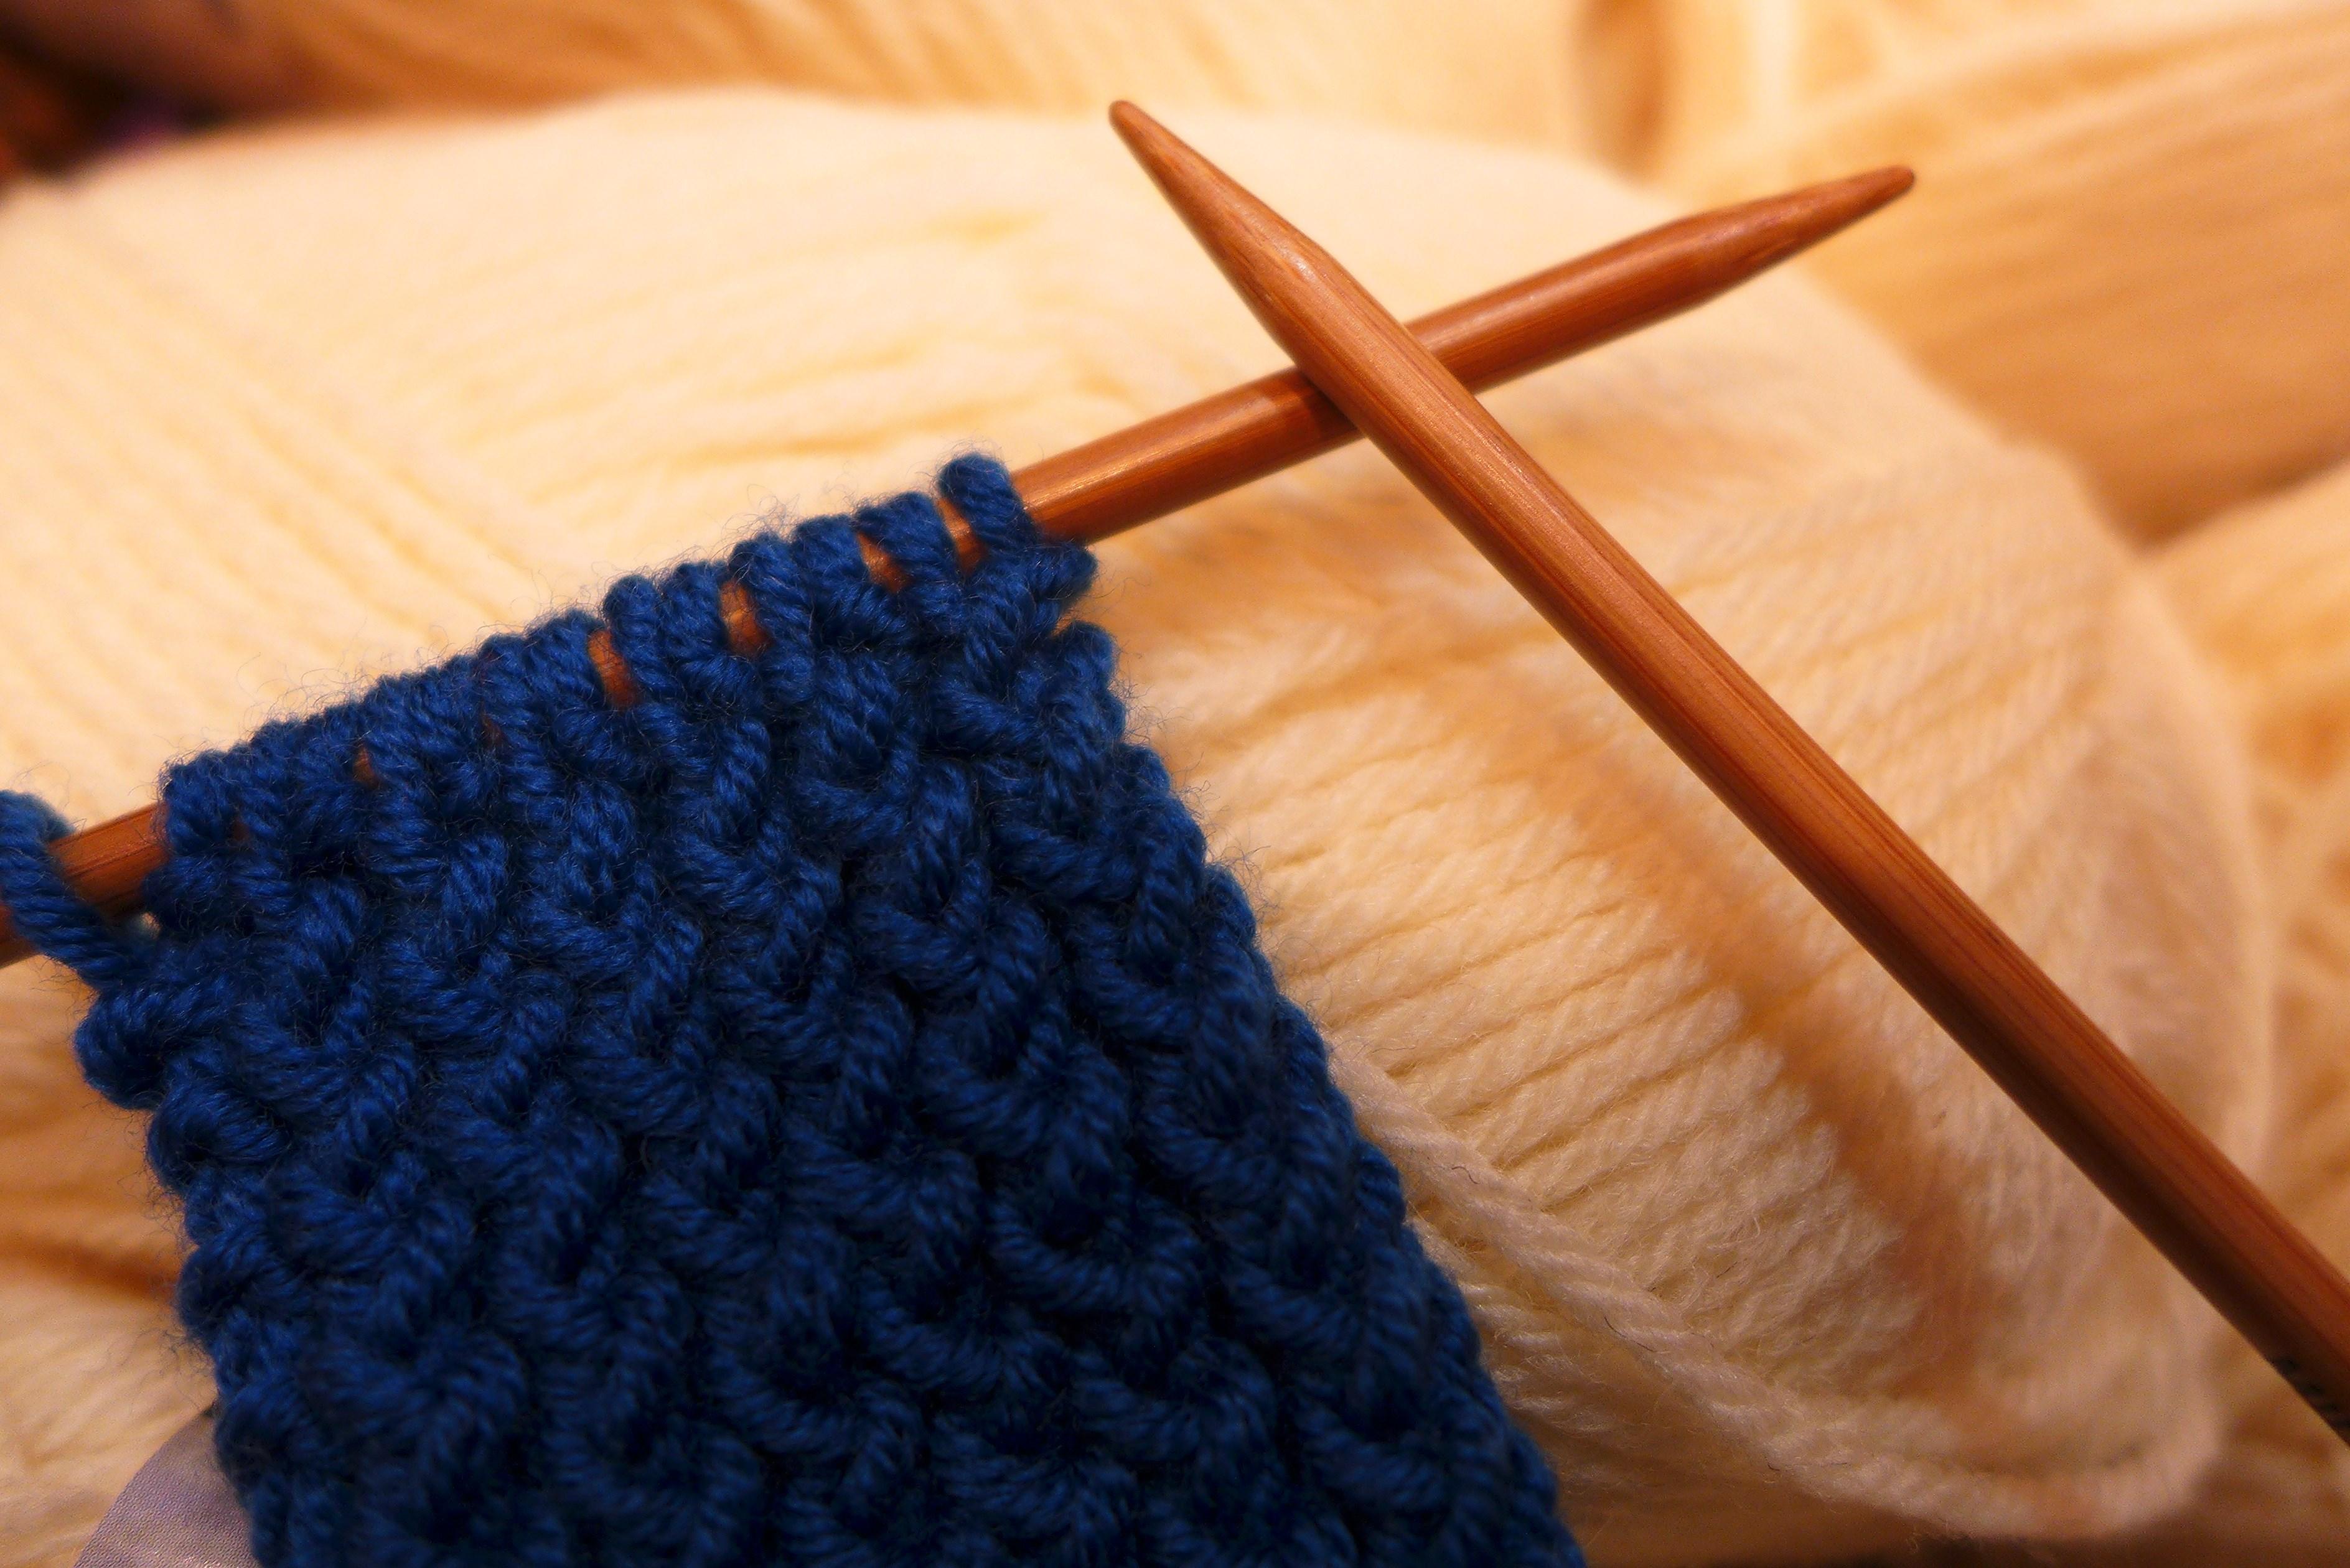 Wallpaper Art Texture Wool Lumix Knitting Pattern Quality Knit Merino Athens Hobby Bamboo Panasonic Greece Needles Handknitting Lx7 Sakalak Sakalakwool 3776x2520 968151 Hd Wallpapers Wallhere